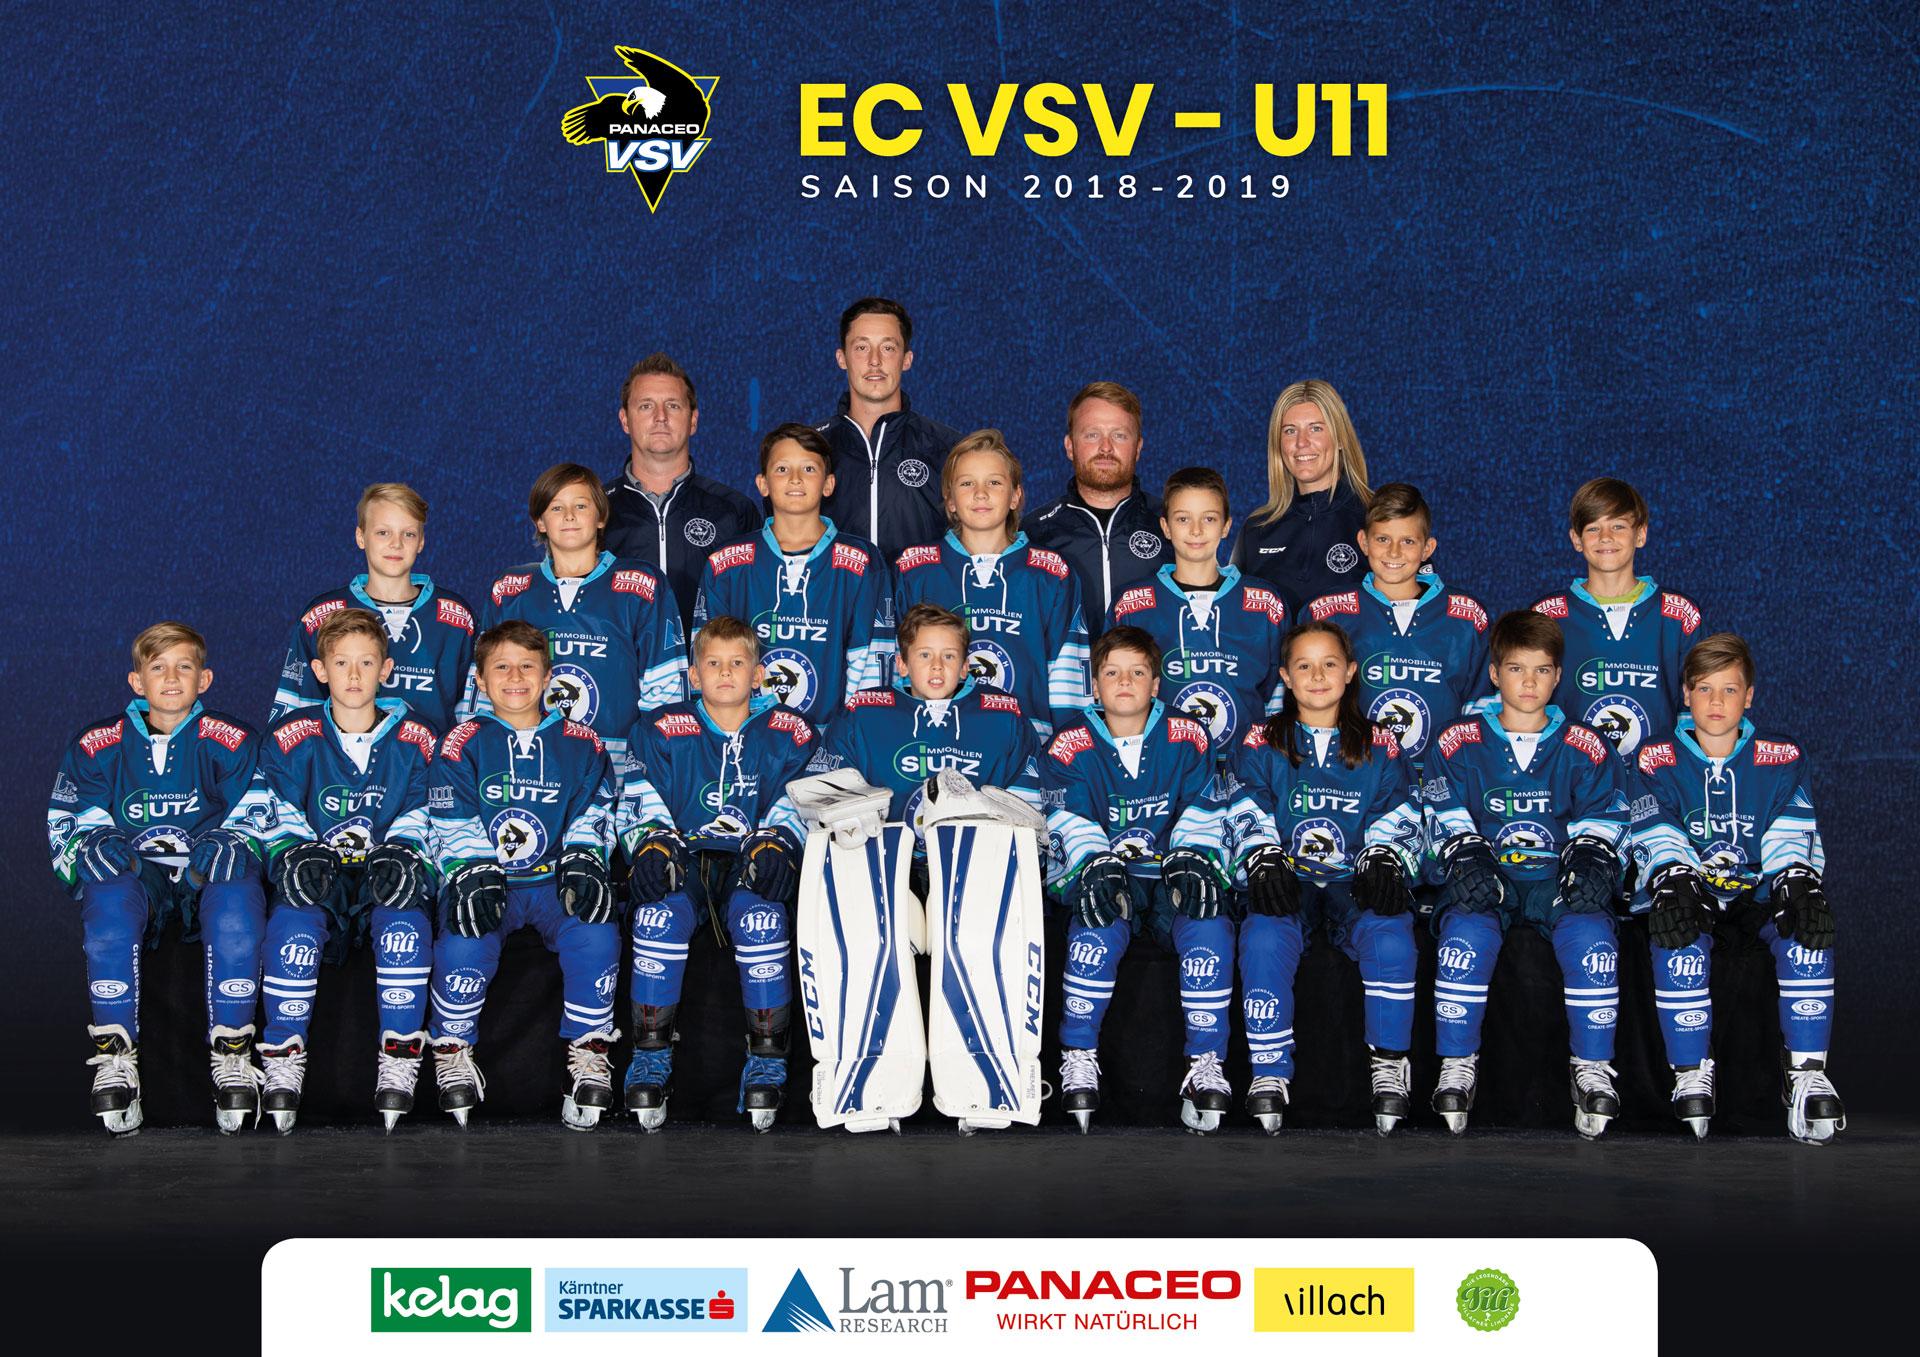 EC PANACEO VSV U11 2018-19